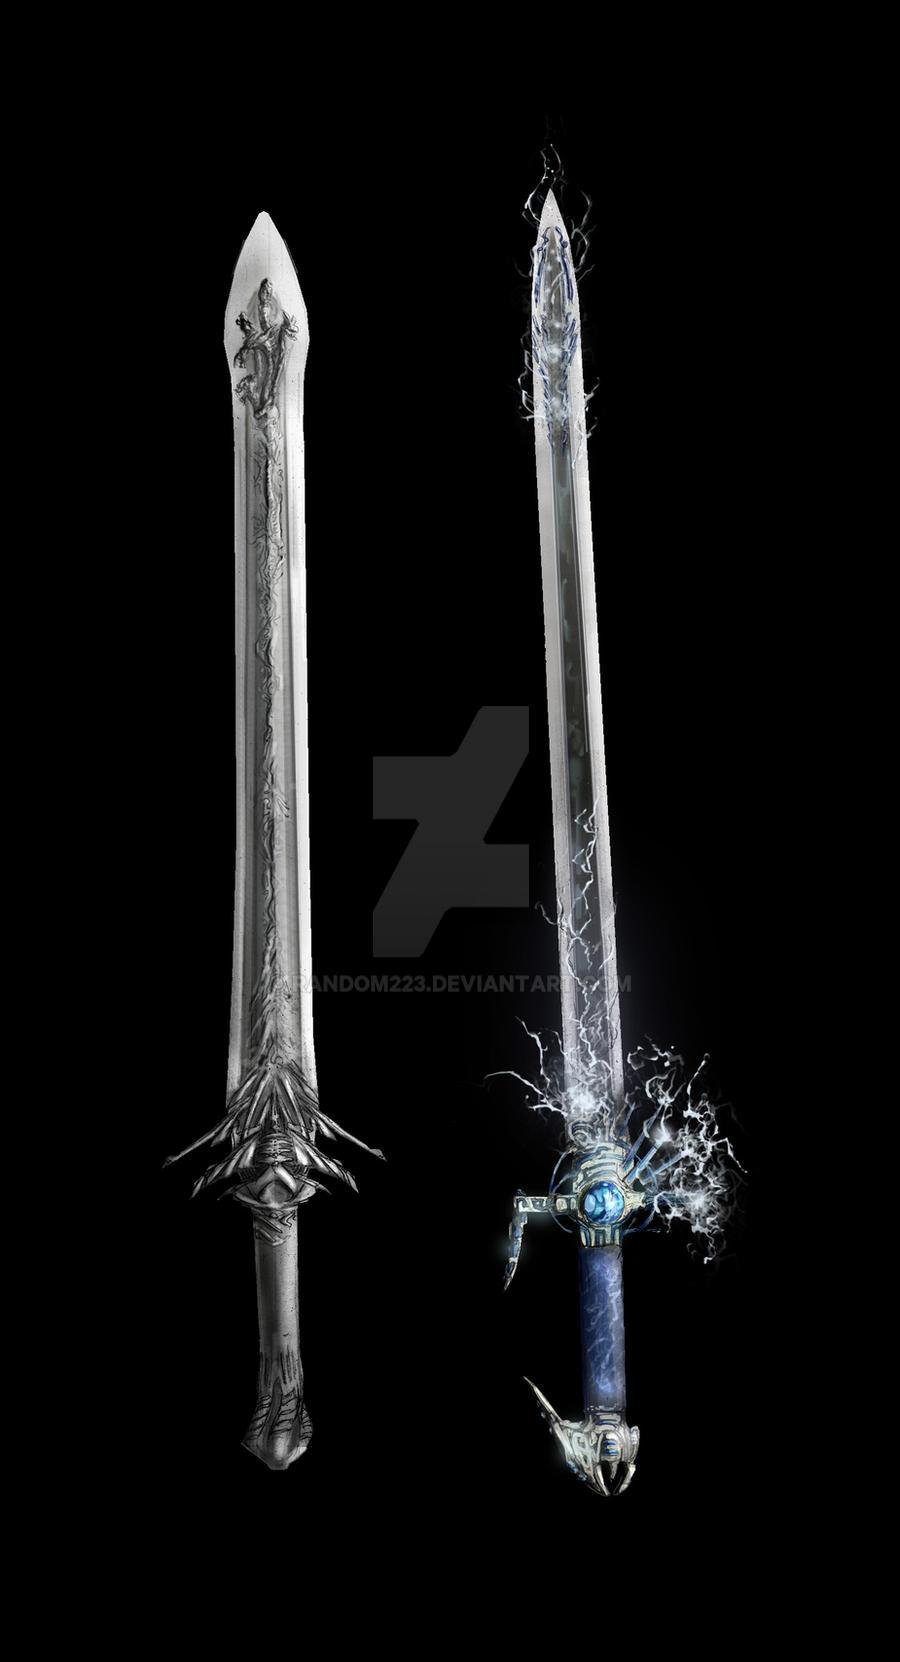 Weaponry 171 by Random223